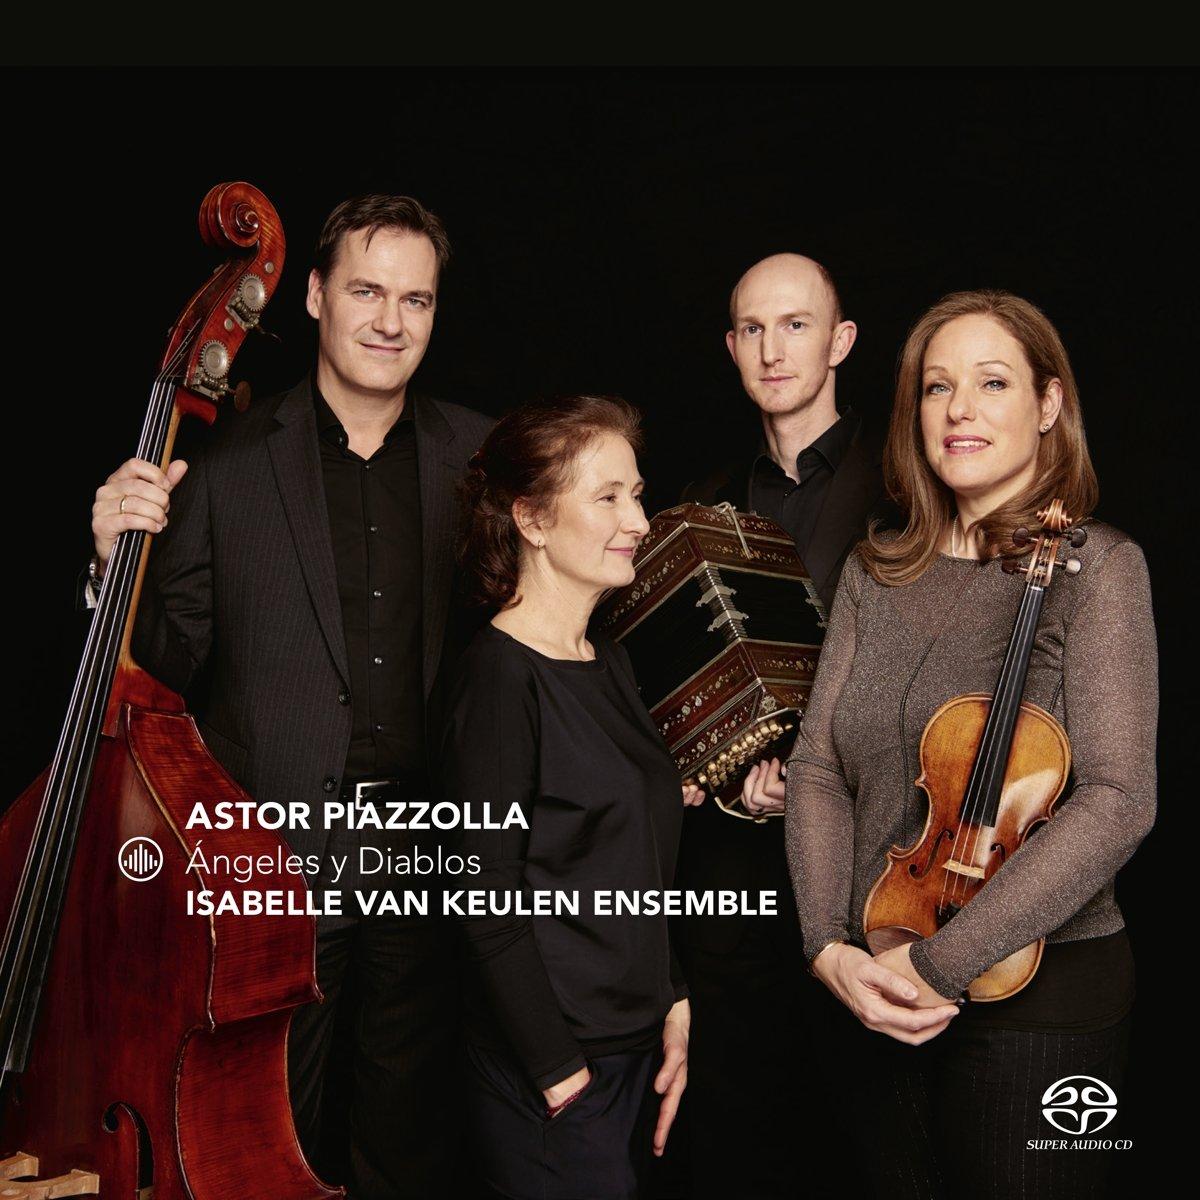 SACD : Isabelle van Keulen Ensemble - Angeles & Diablos (Hybrid SACD)